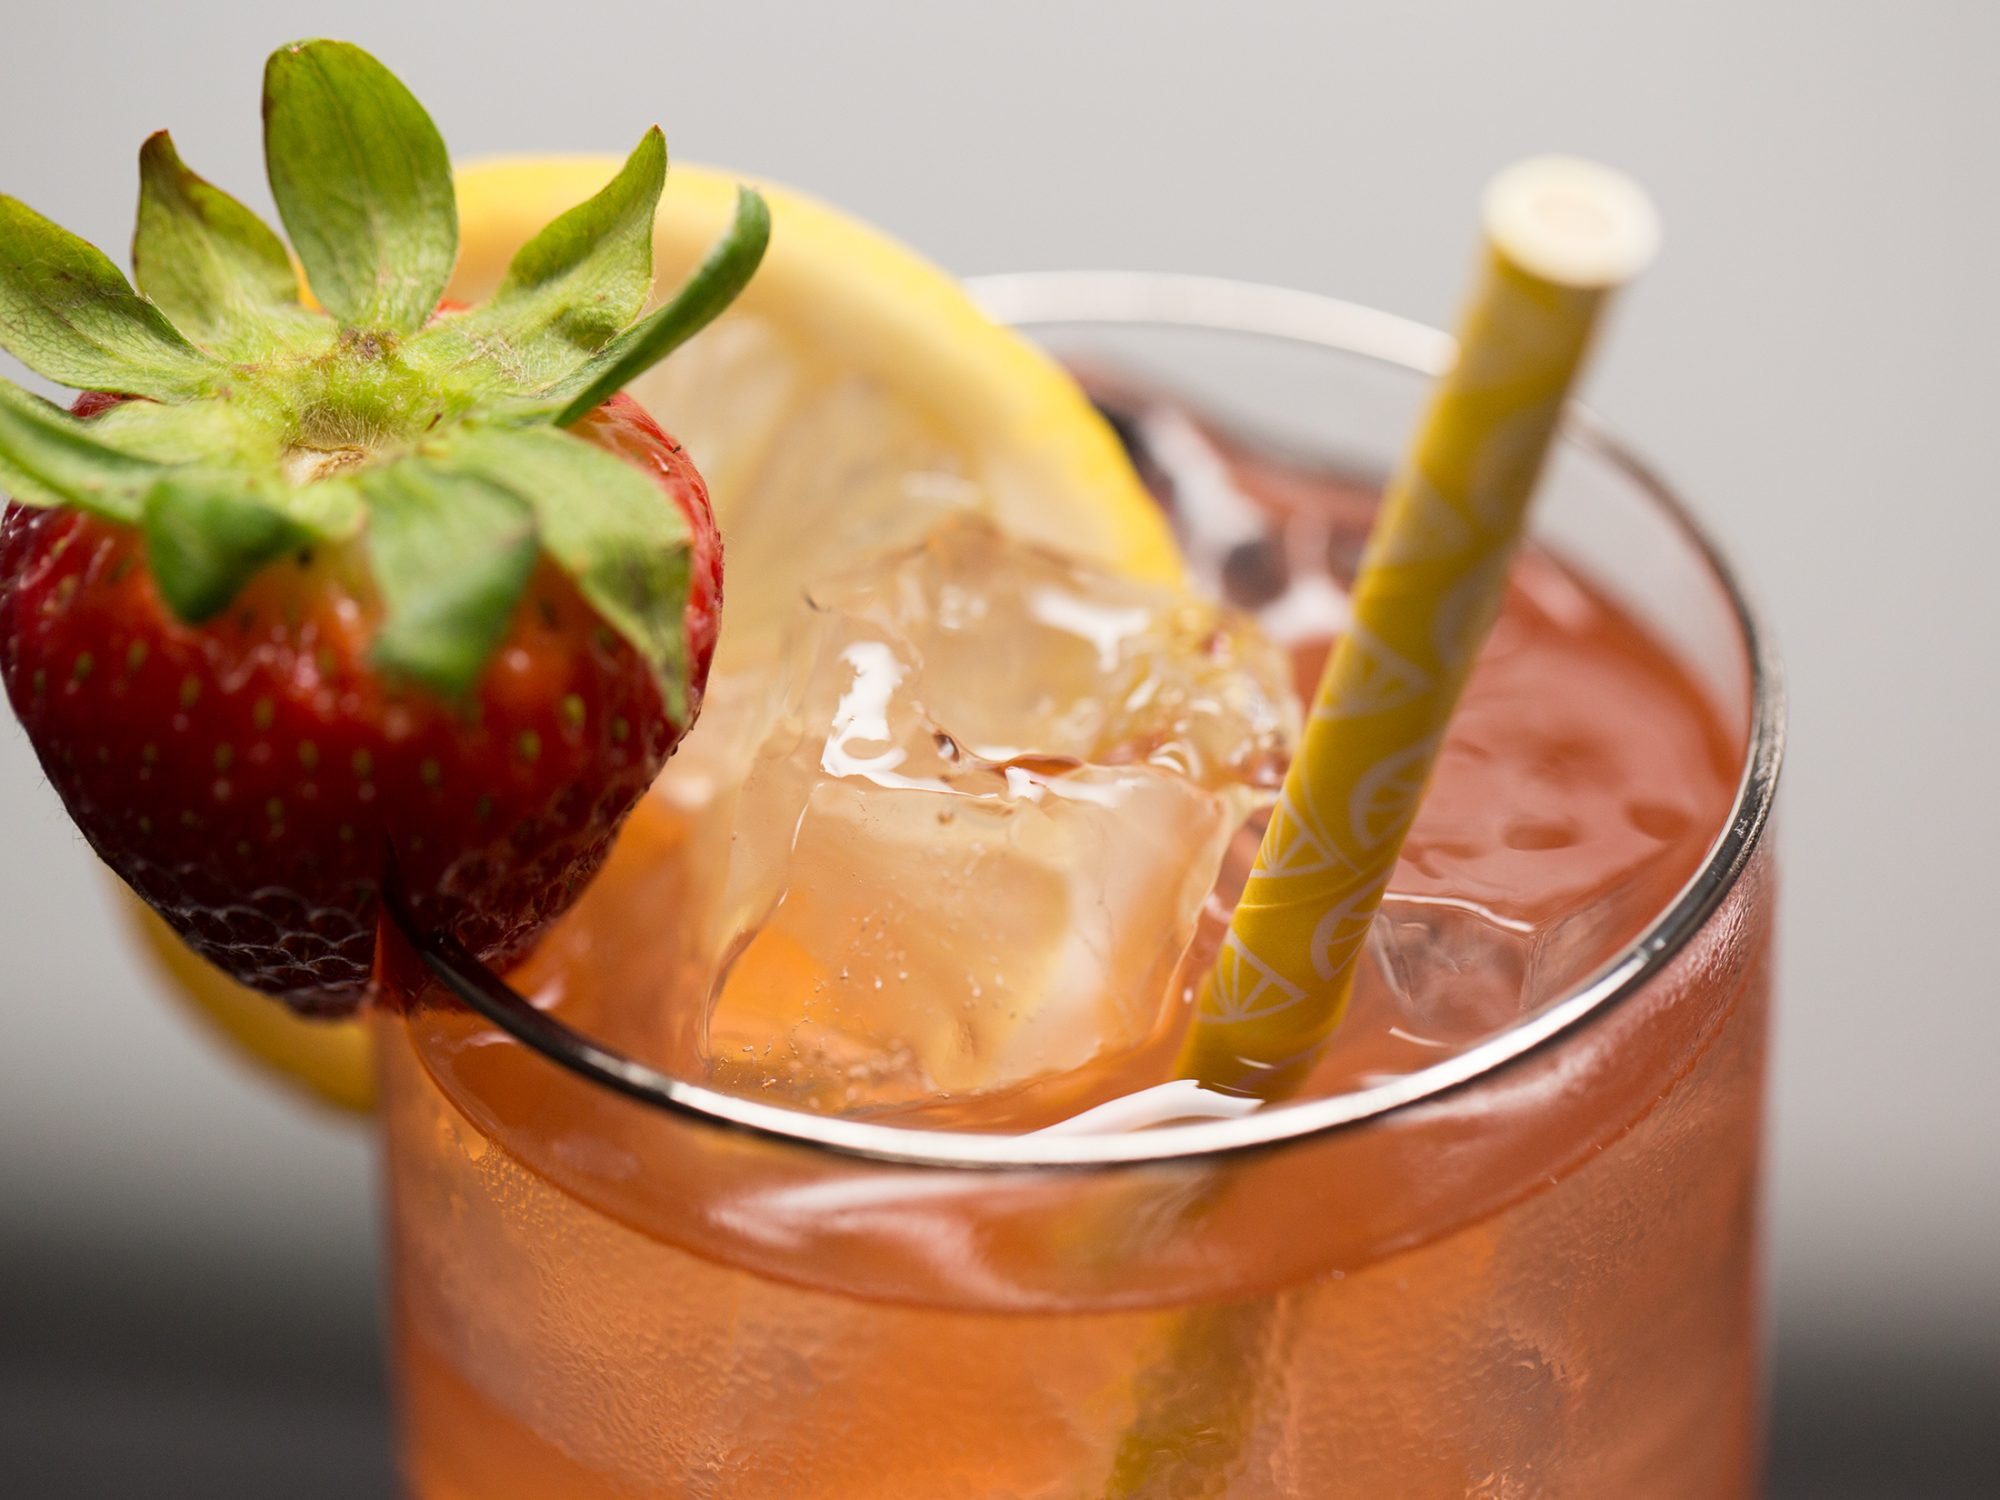 Skinny Strawberry Vodka Lemonade image